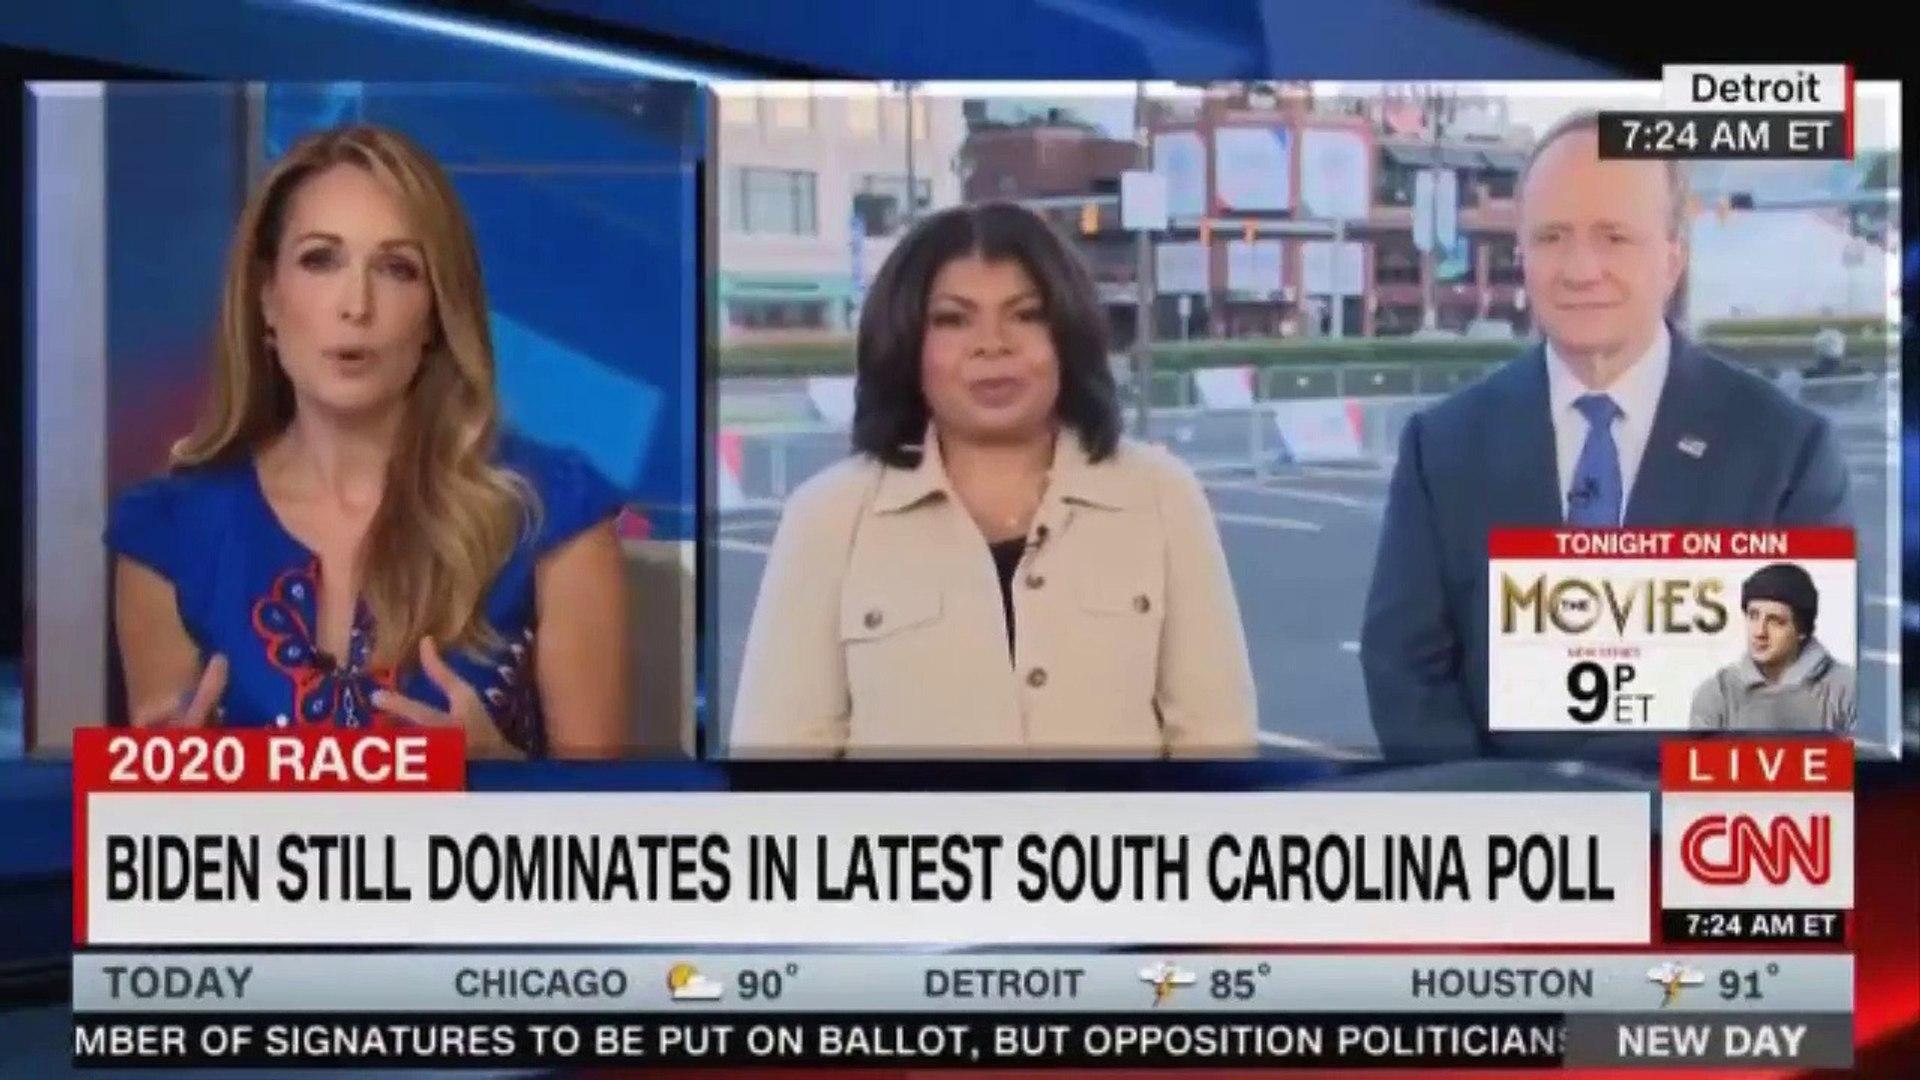 2020 RACE  BOOKER, BIDEN, HARRIS TO SHARE  STAGE IN CNN DEBATE.  CNN NEWS LIVE APRIL RYAN